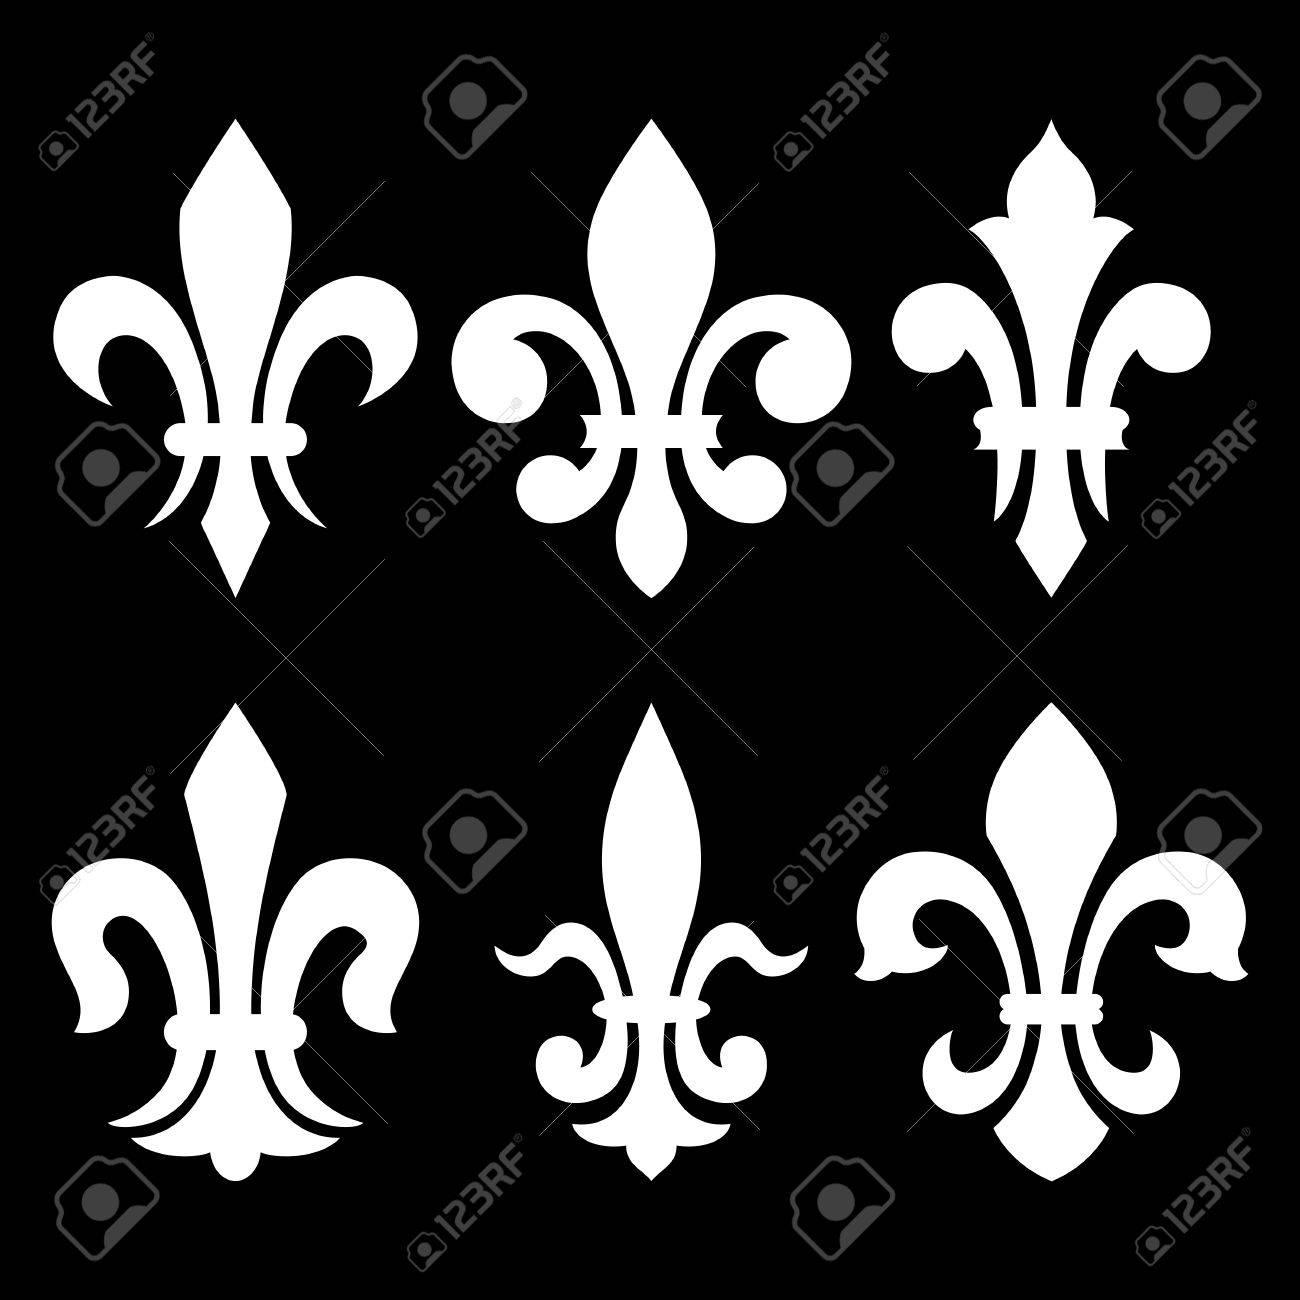 Lily flower heraldic symbol fleur de lis vector image royalty lily flower heraldic symbol fleur de lis vector image stock vector izmirmasajfo